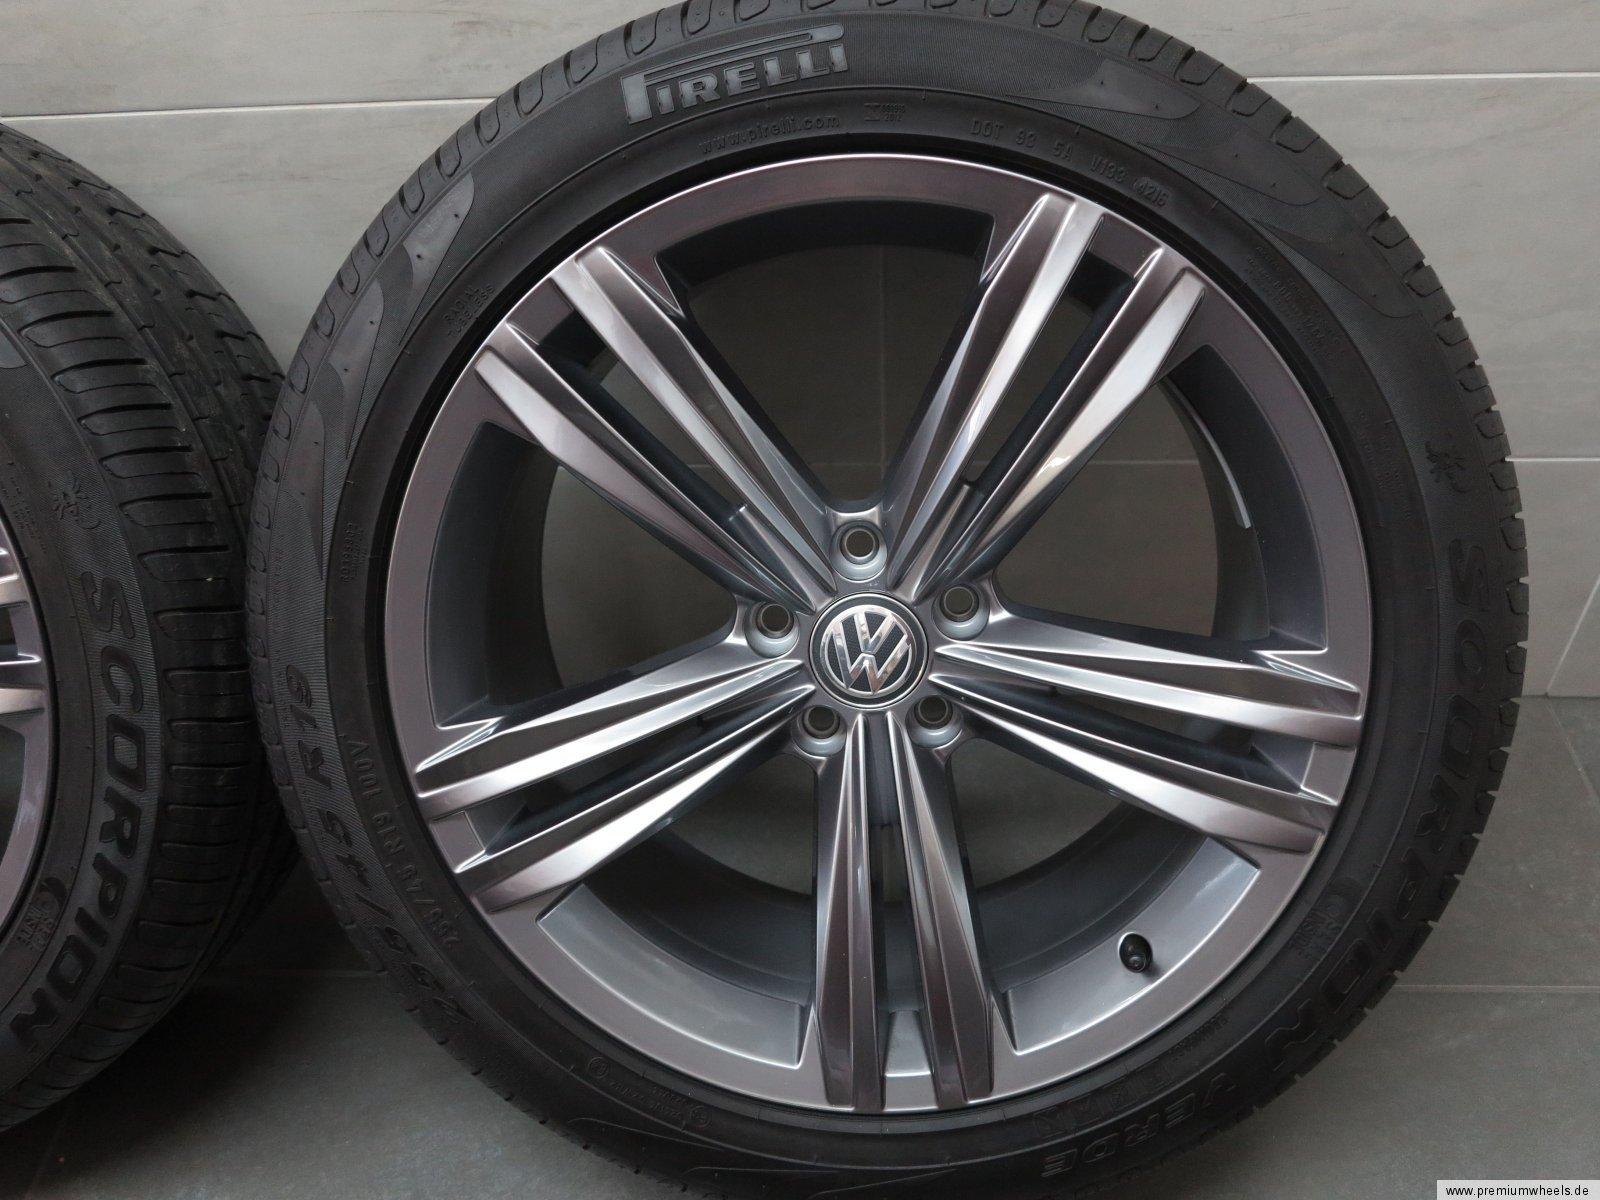 19 inch summer wheels original vw tiguan ii ad1 5n rims. Black Bedroom Furniture Sets. Home Design Ideas